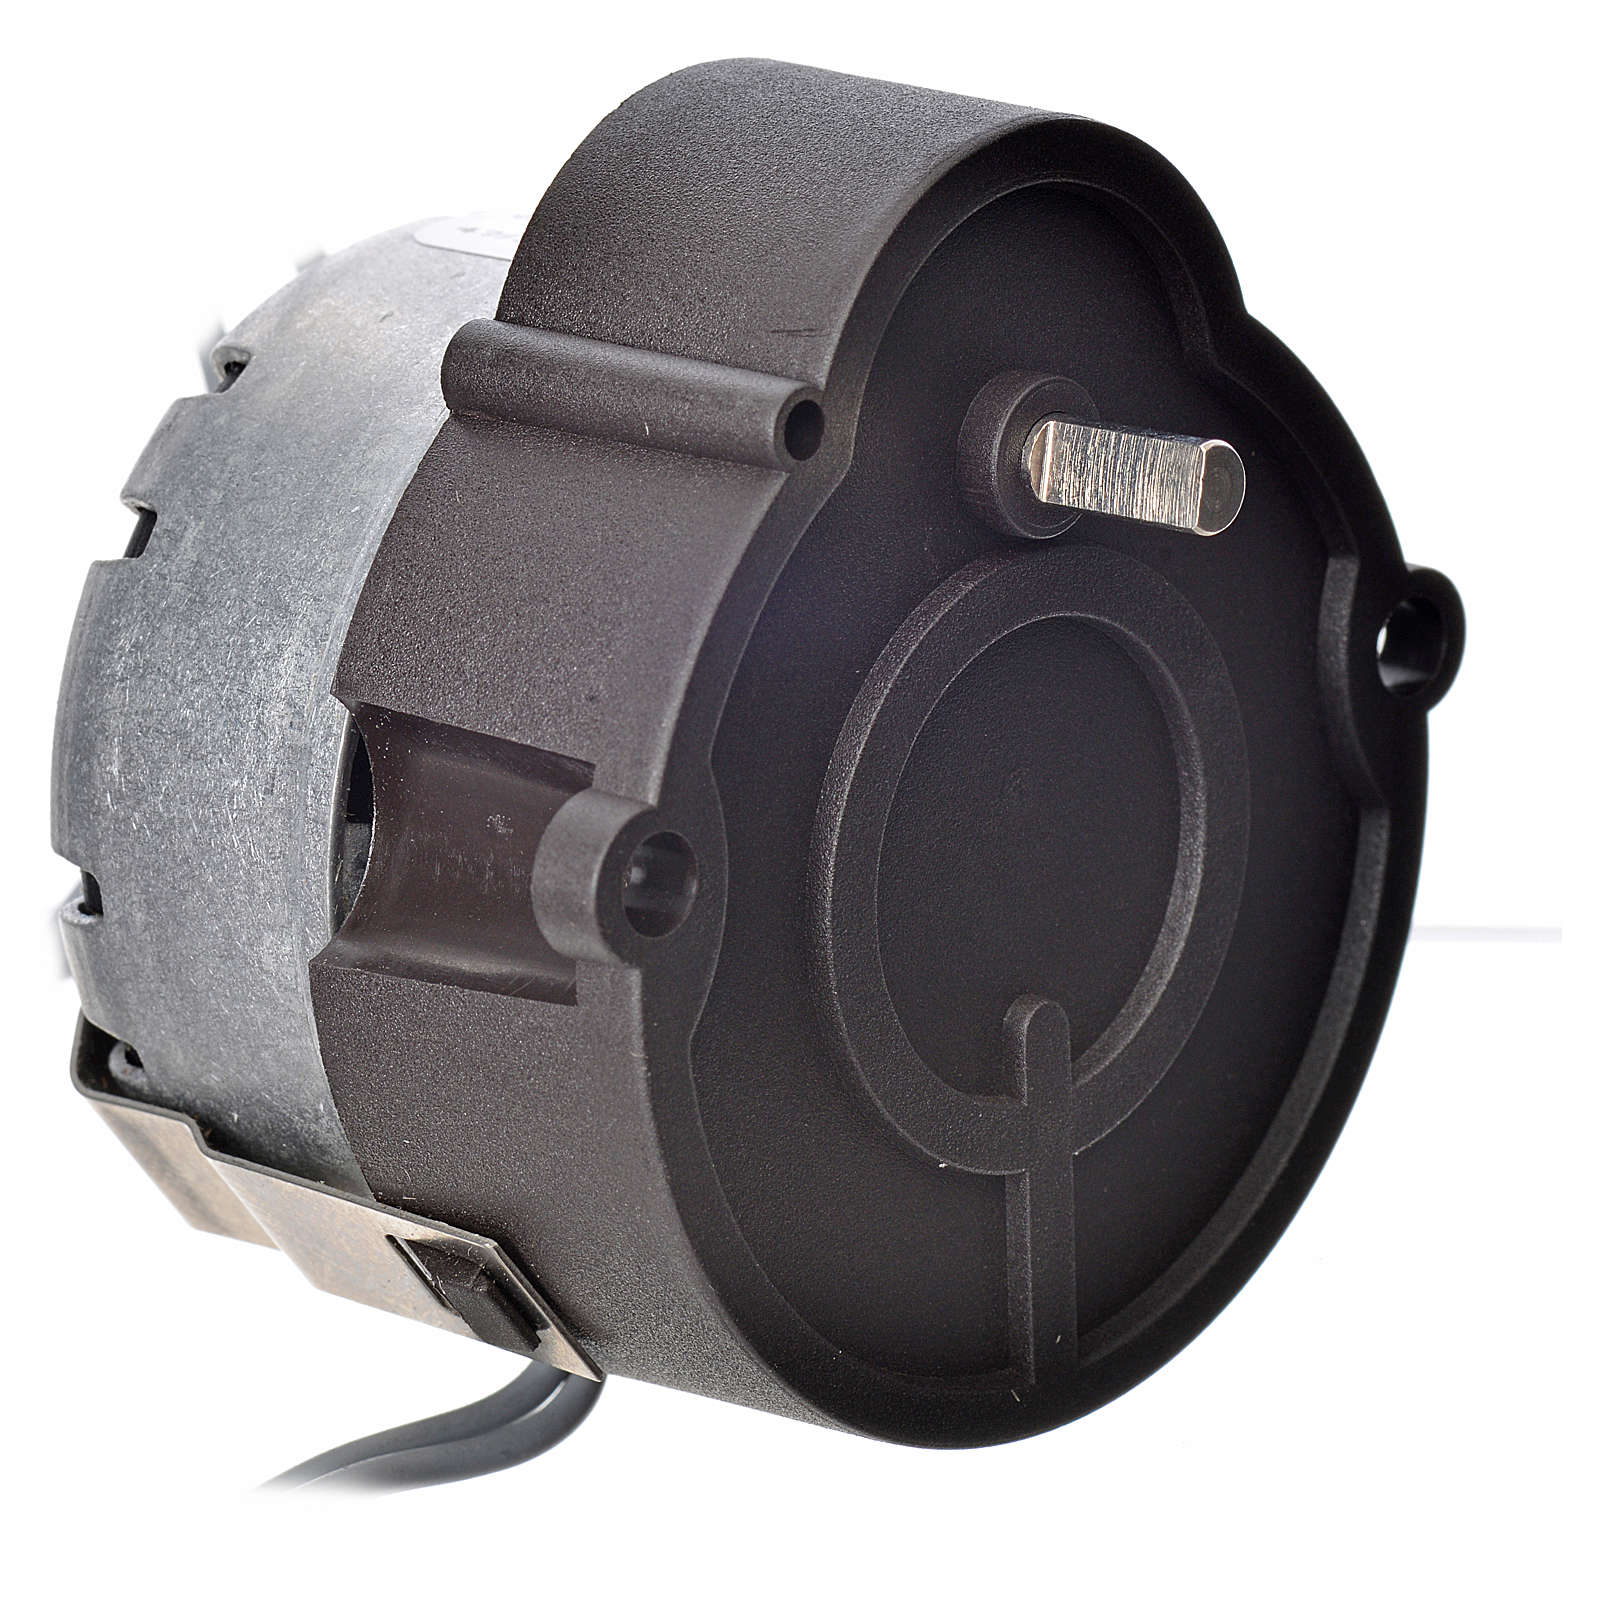 Motoriduttore presepe  MR giri/minuto 5 4